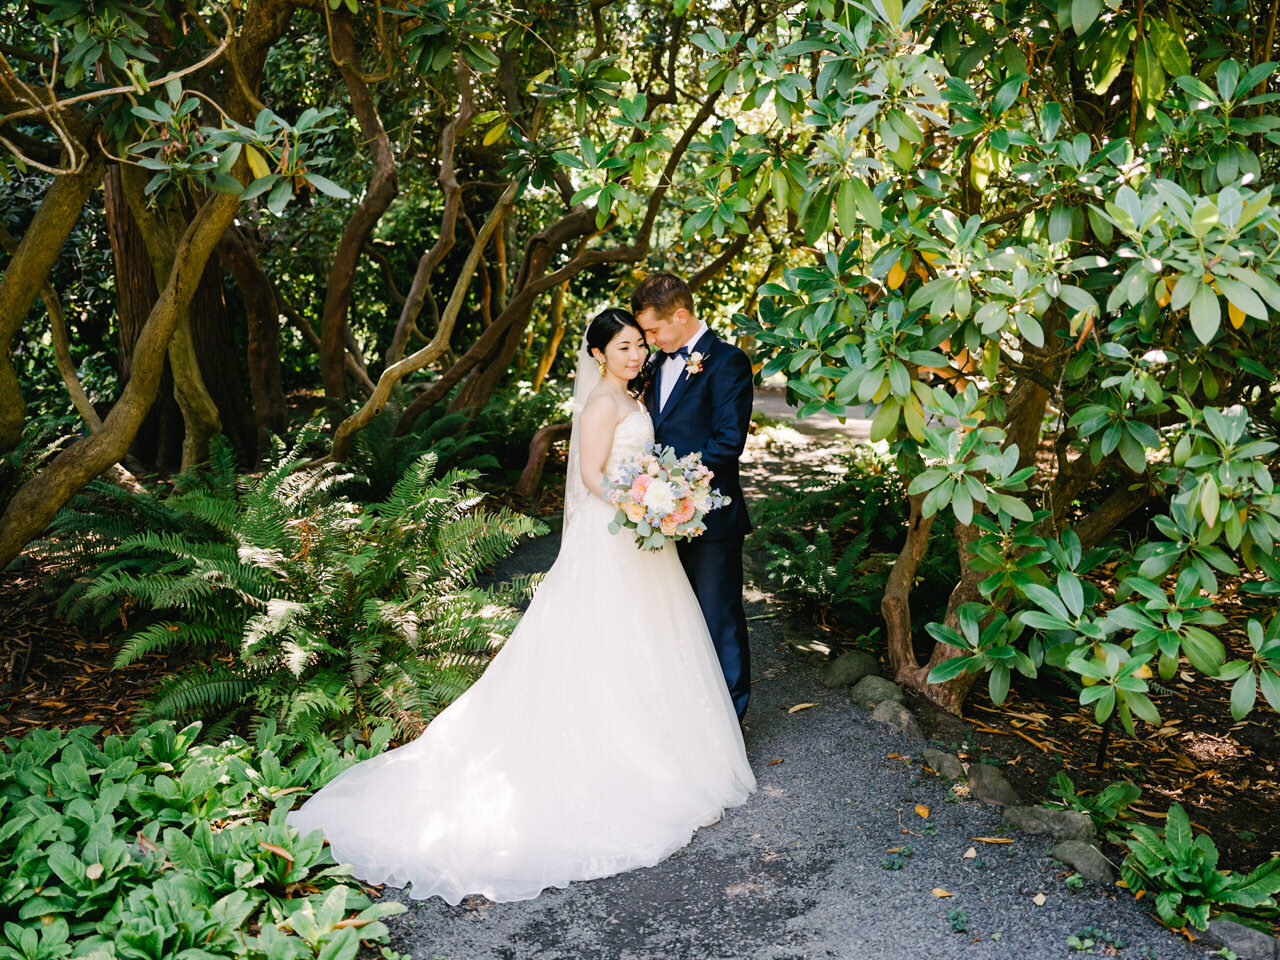 crystal-springs-rhododendron-garden-oregon-wedding-047.JPG